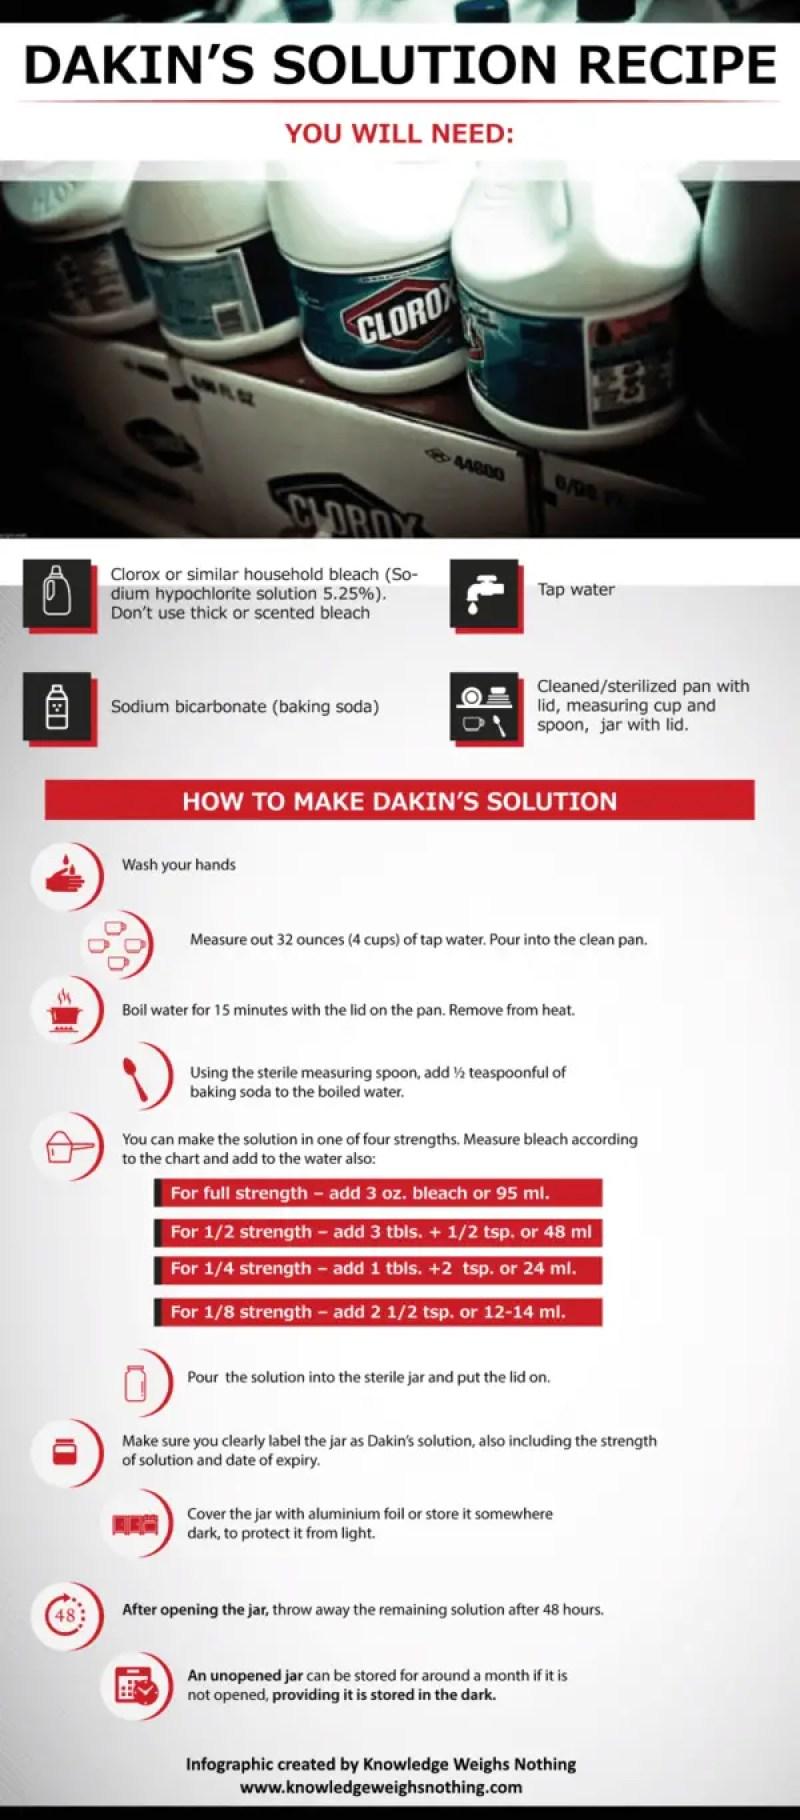 Dakin's Solution recipe infographic